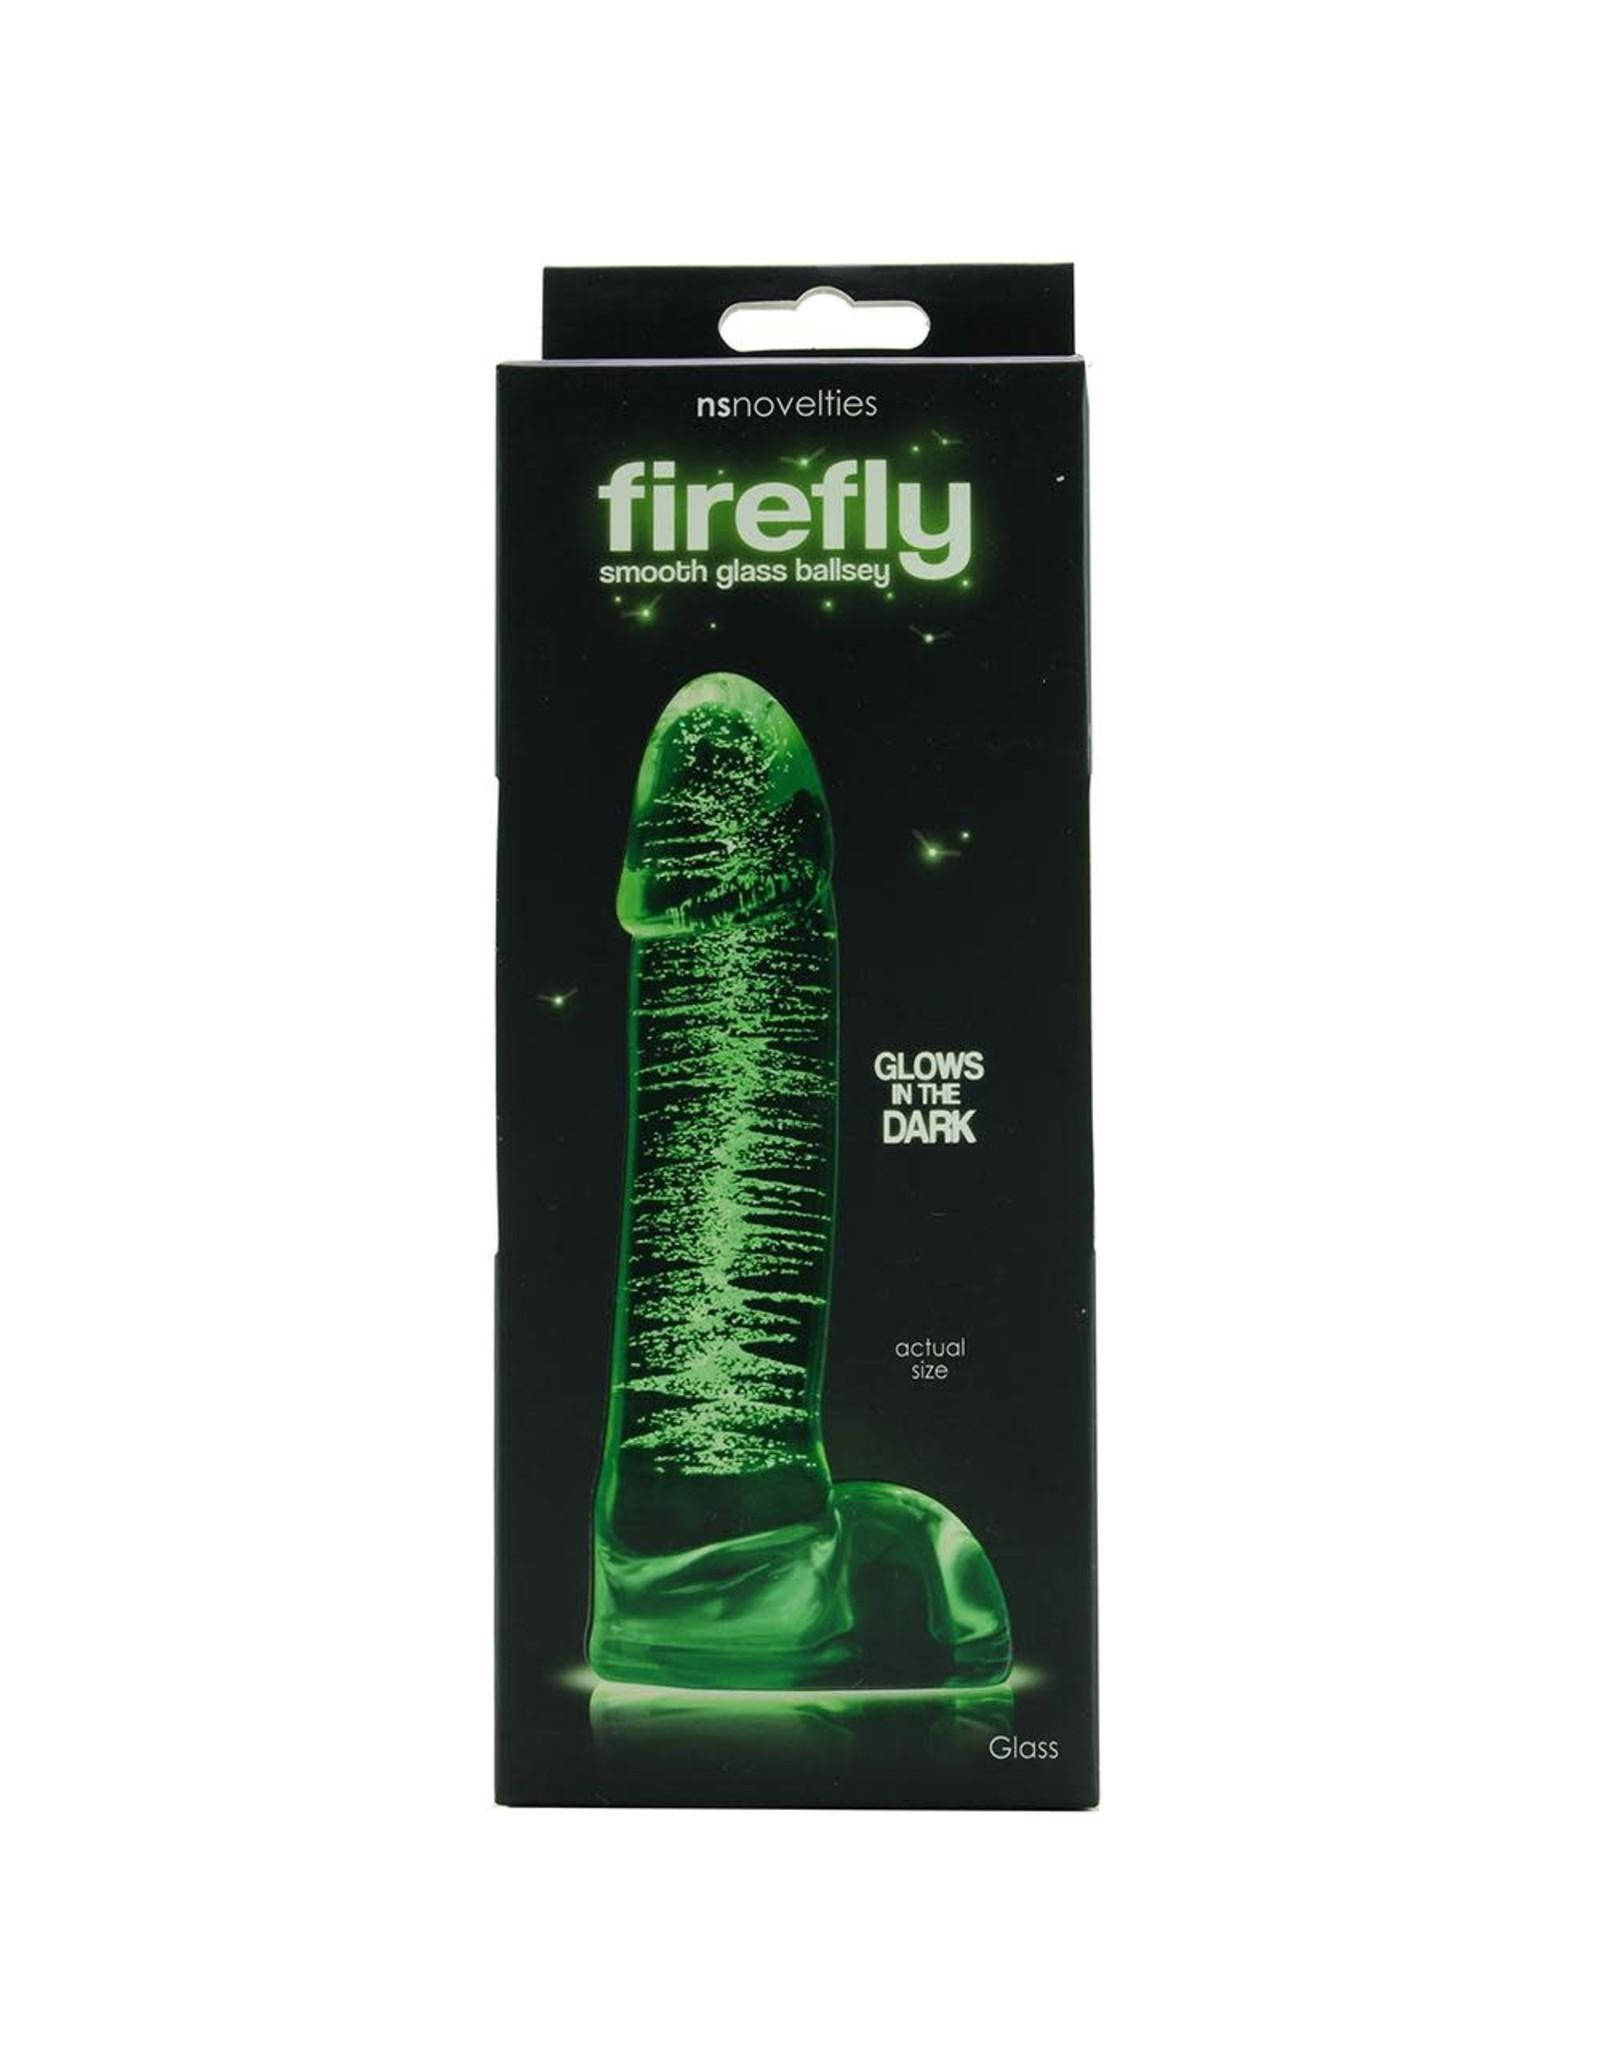 NSNOVELTIES FIREFLY - GLOW IN THE DARK GLASS - BALLSY DILDO